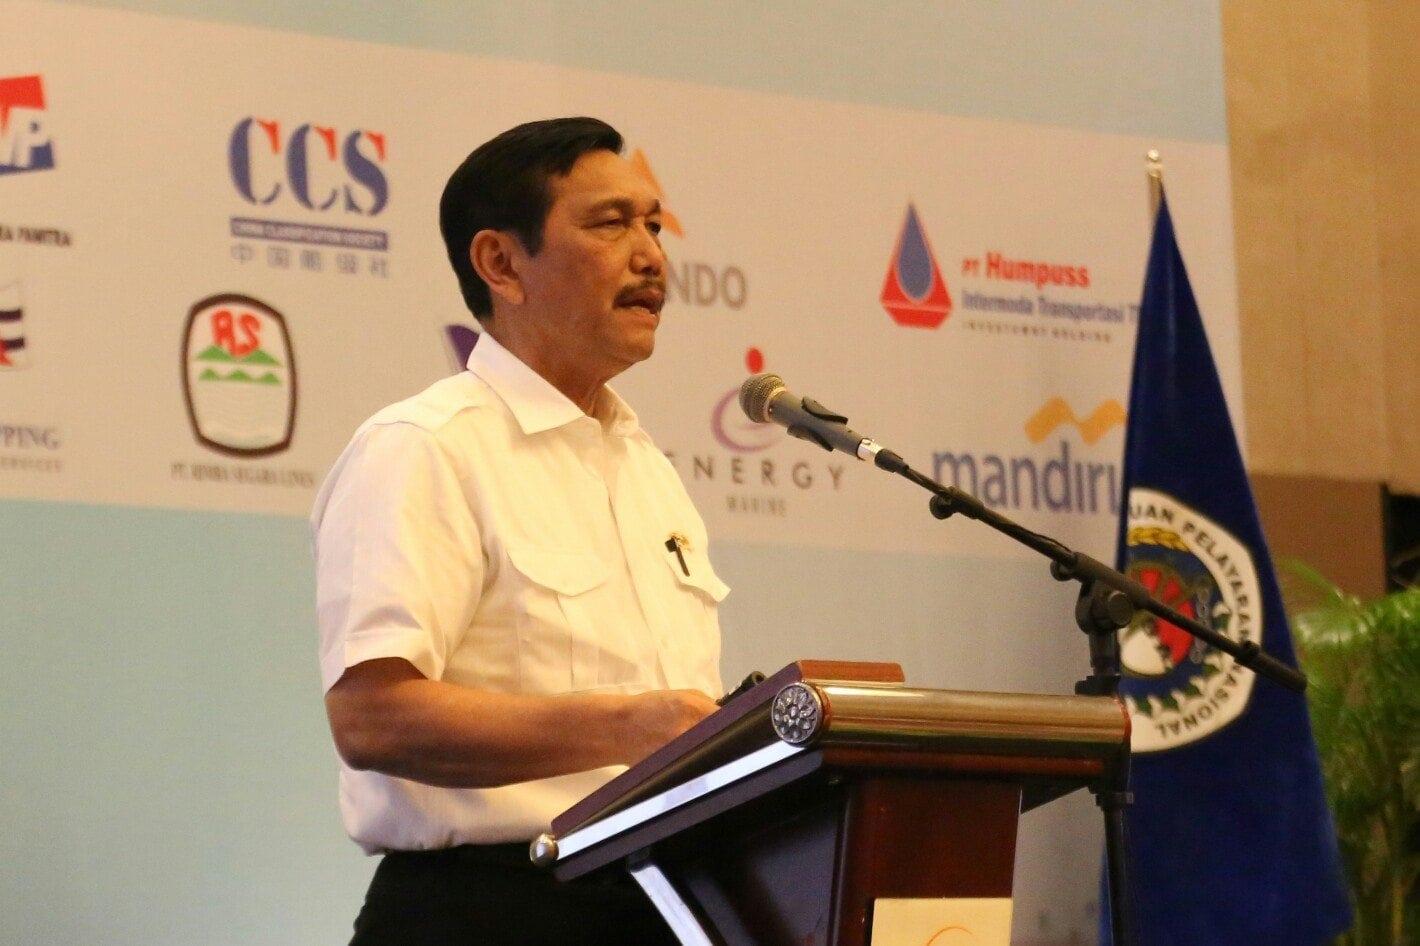 Menko Luhut B. Pandjaitan menjadi pembicara pada acara Forum Nasional INSA 2017 di Makassar